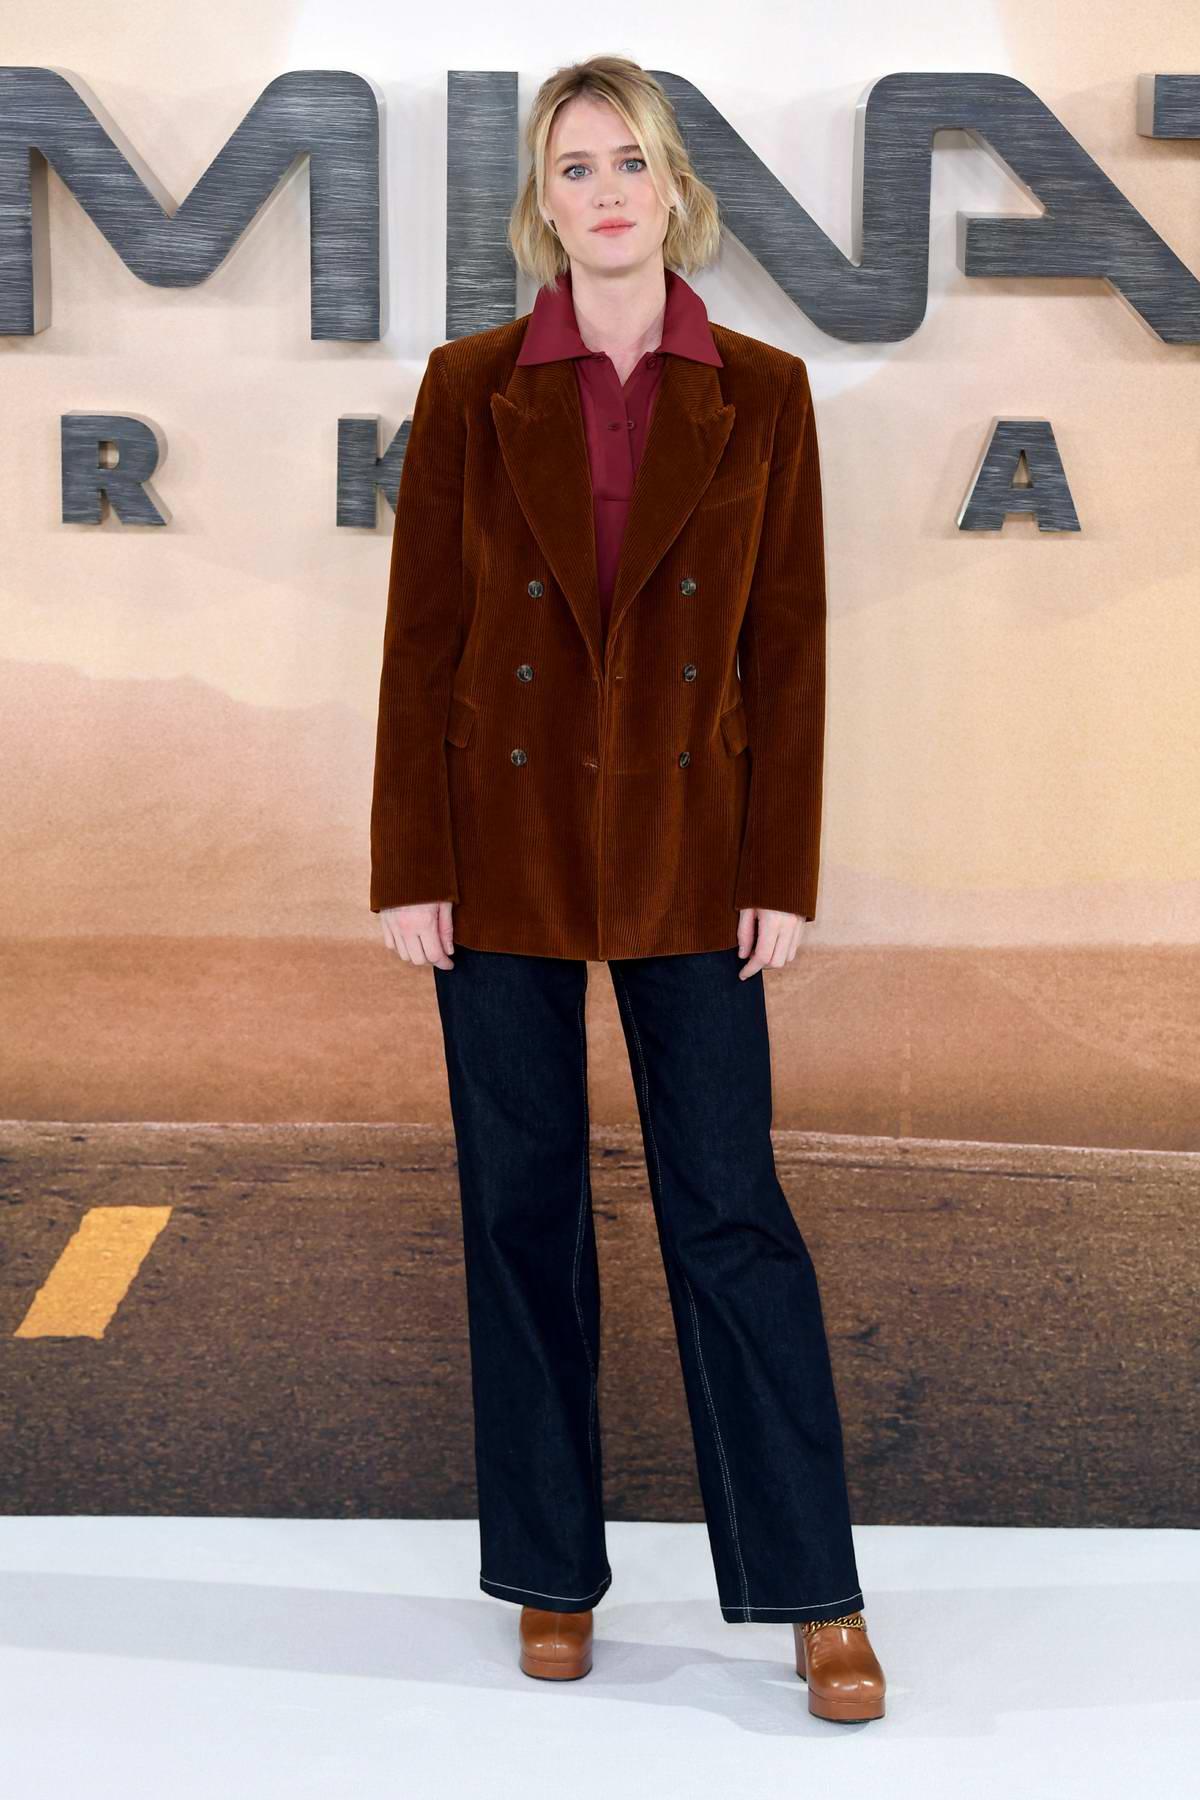 Mackenzie Davis attends 'Terminator: Dark Fate' photocall at the Mandarin Oriental Hotel in London, UK